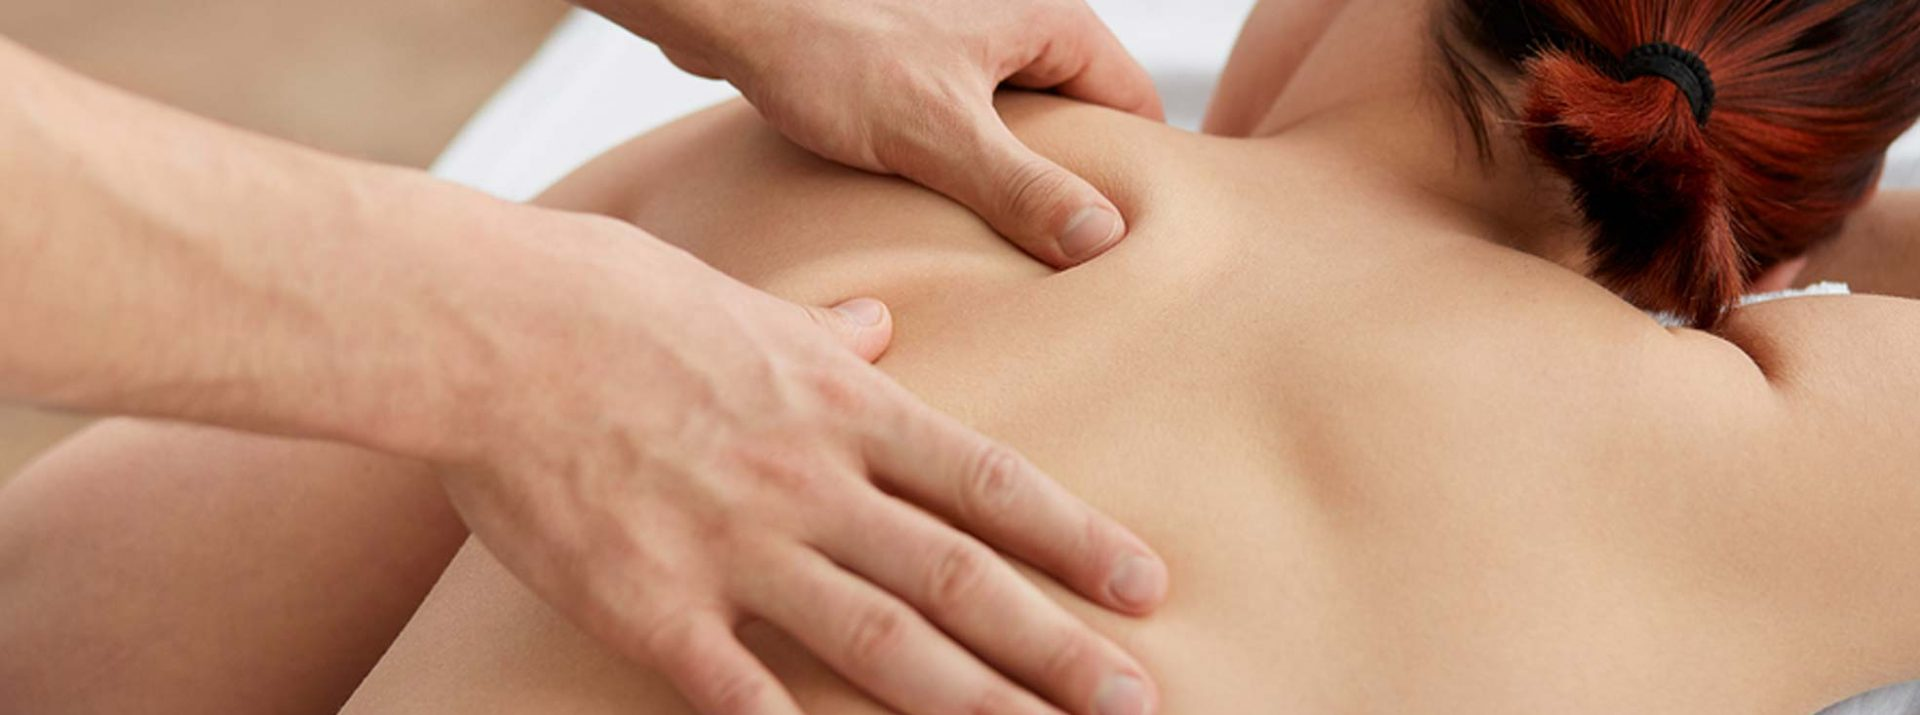 massage slider